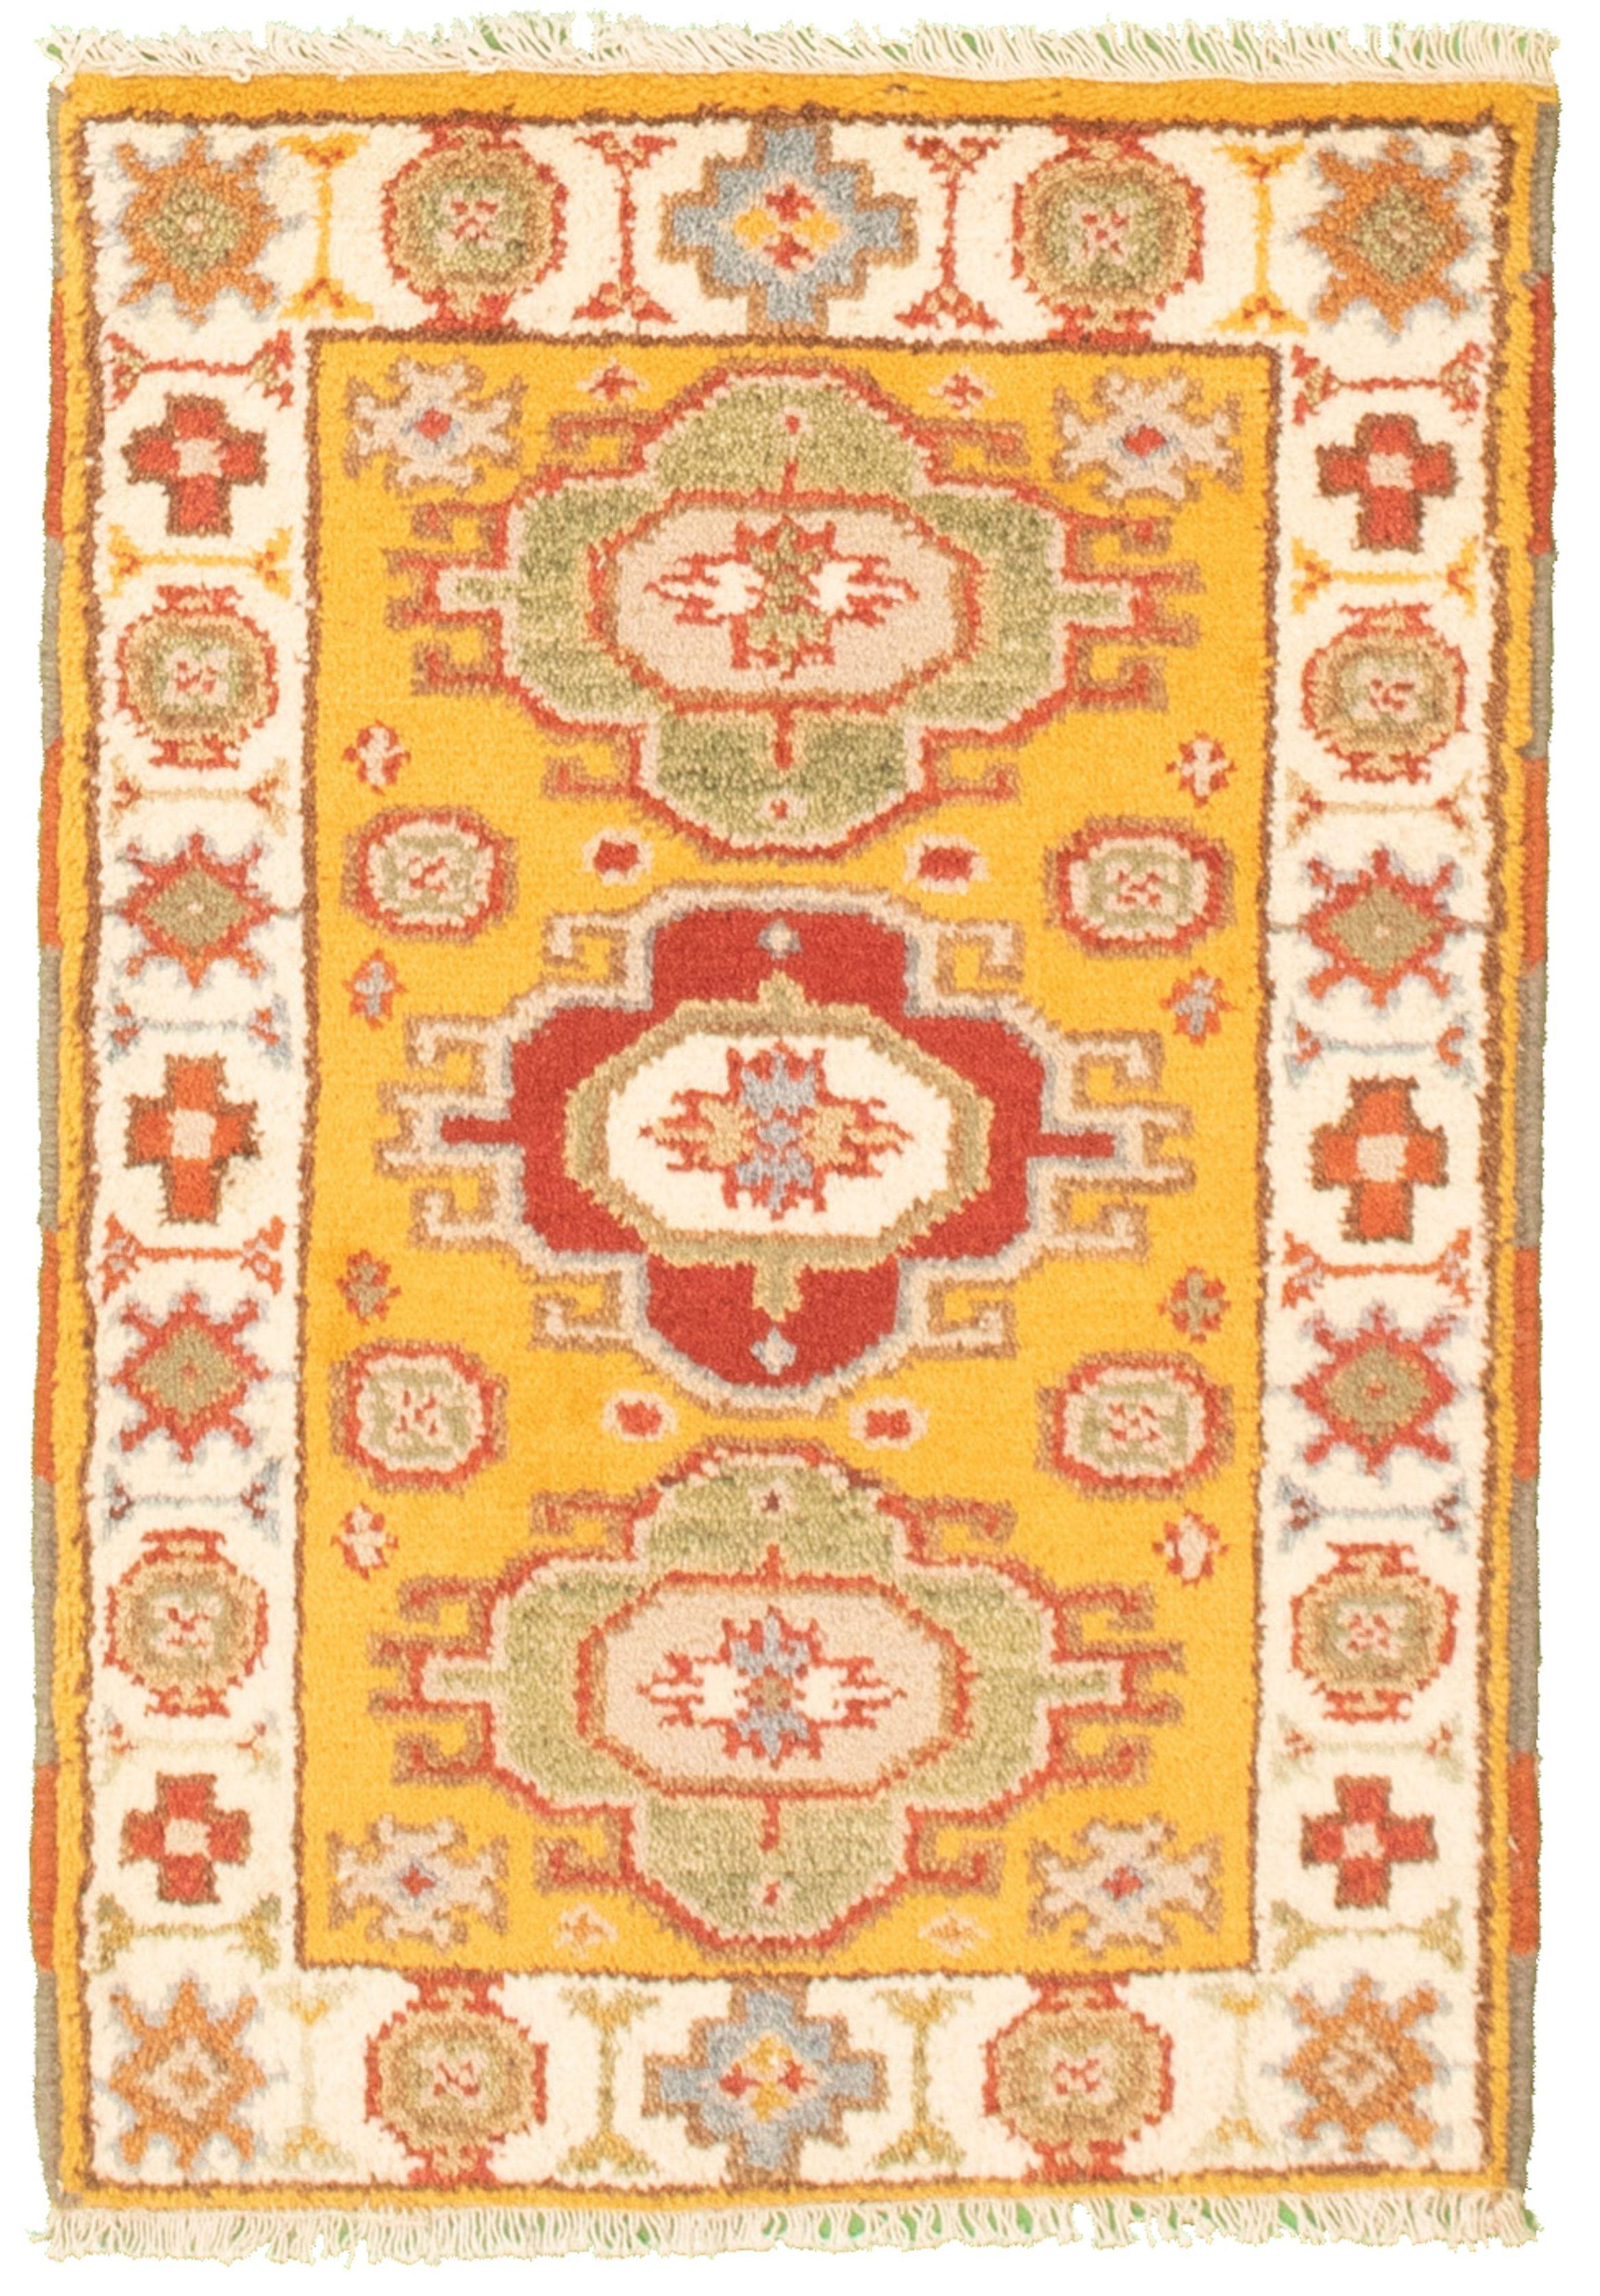 "Hand-knotted Royal Kazak Light Orange Cotton Rug 2'1"" x 3'0""  Size: 2'1"" x 3'0"""